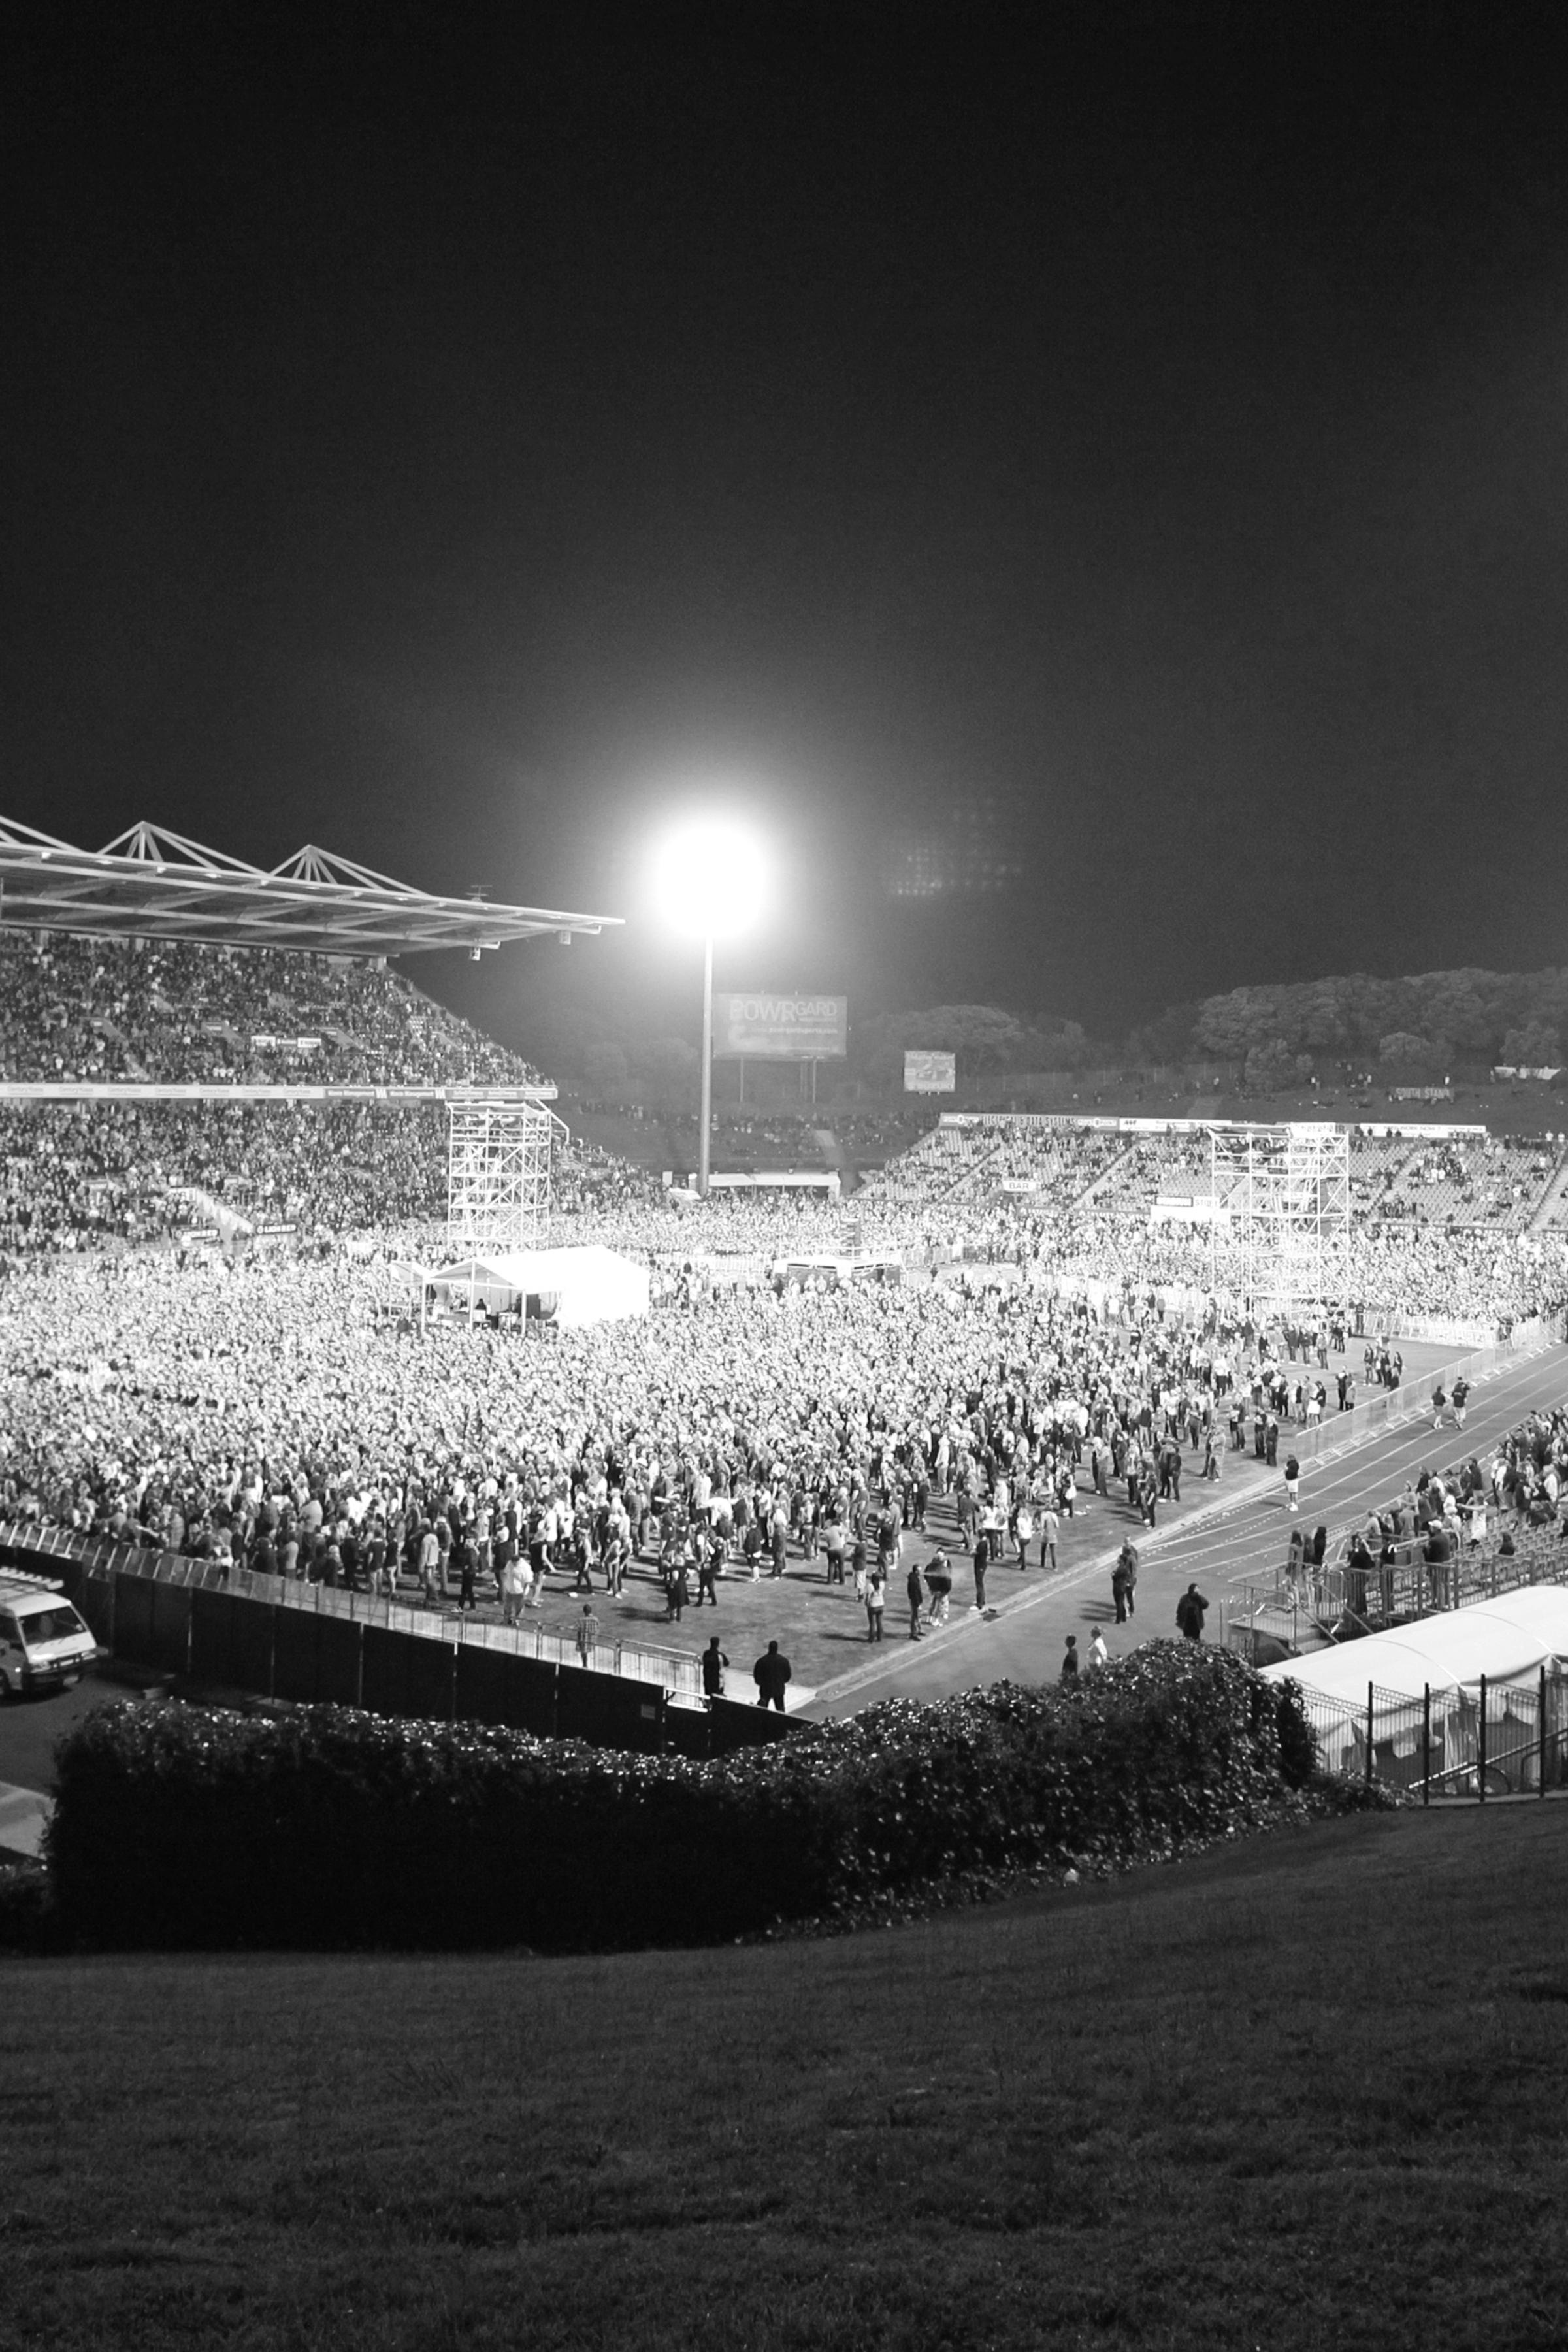 Mt Smart Stadium Ranked #15 Worldwide In 2020 Pollstar Mid-year Special